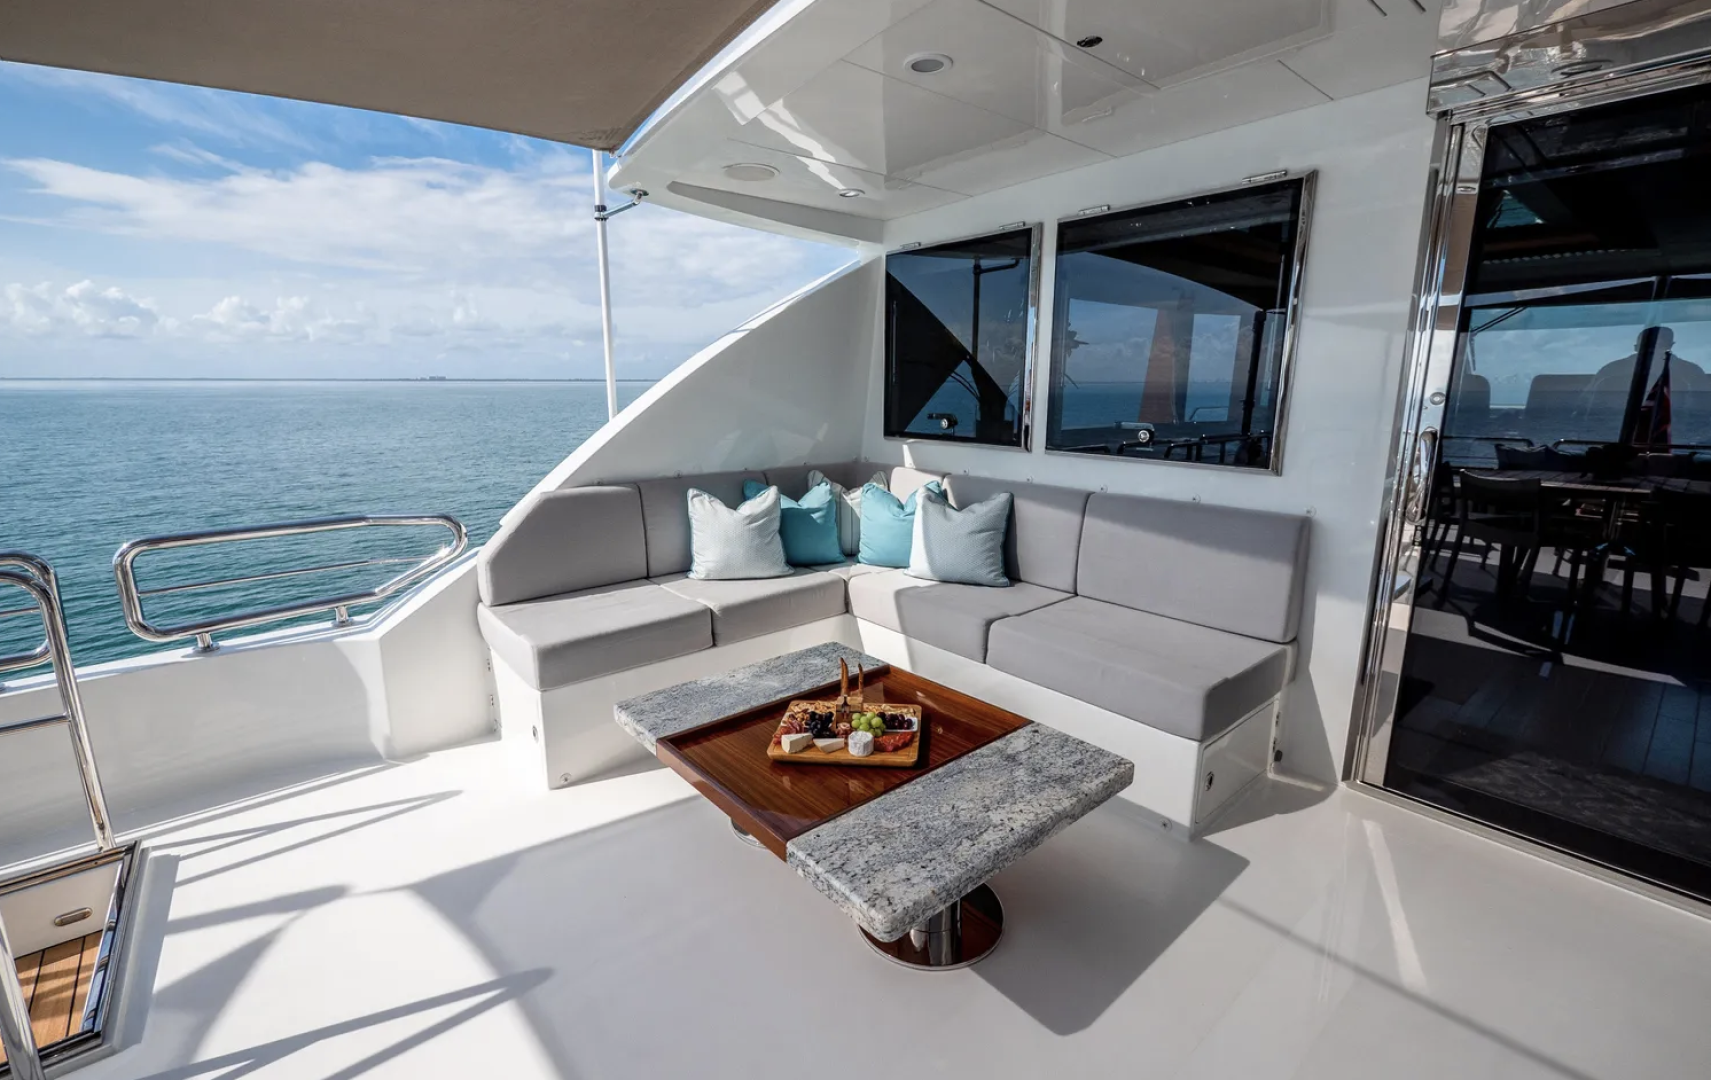 Ocean Alexander-100 Skylounge 2016-Sea N Sea Naples-Florida-United States-Aft Deck Seating-1596368 | Thumbnail